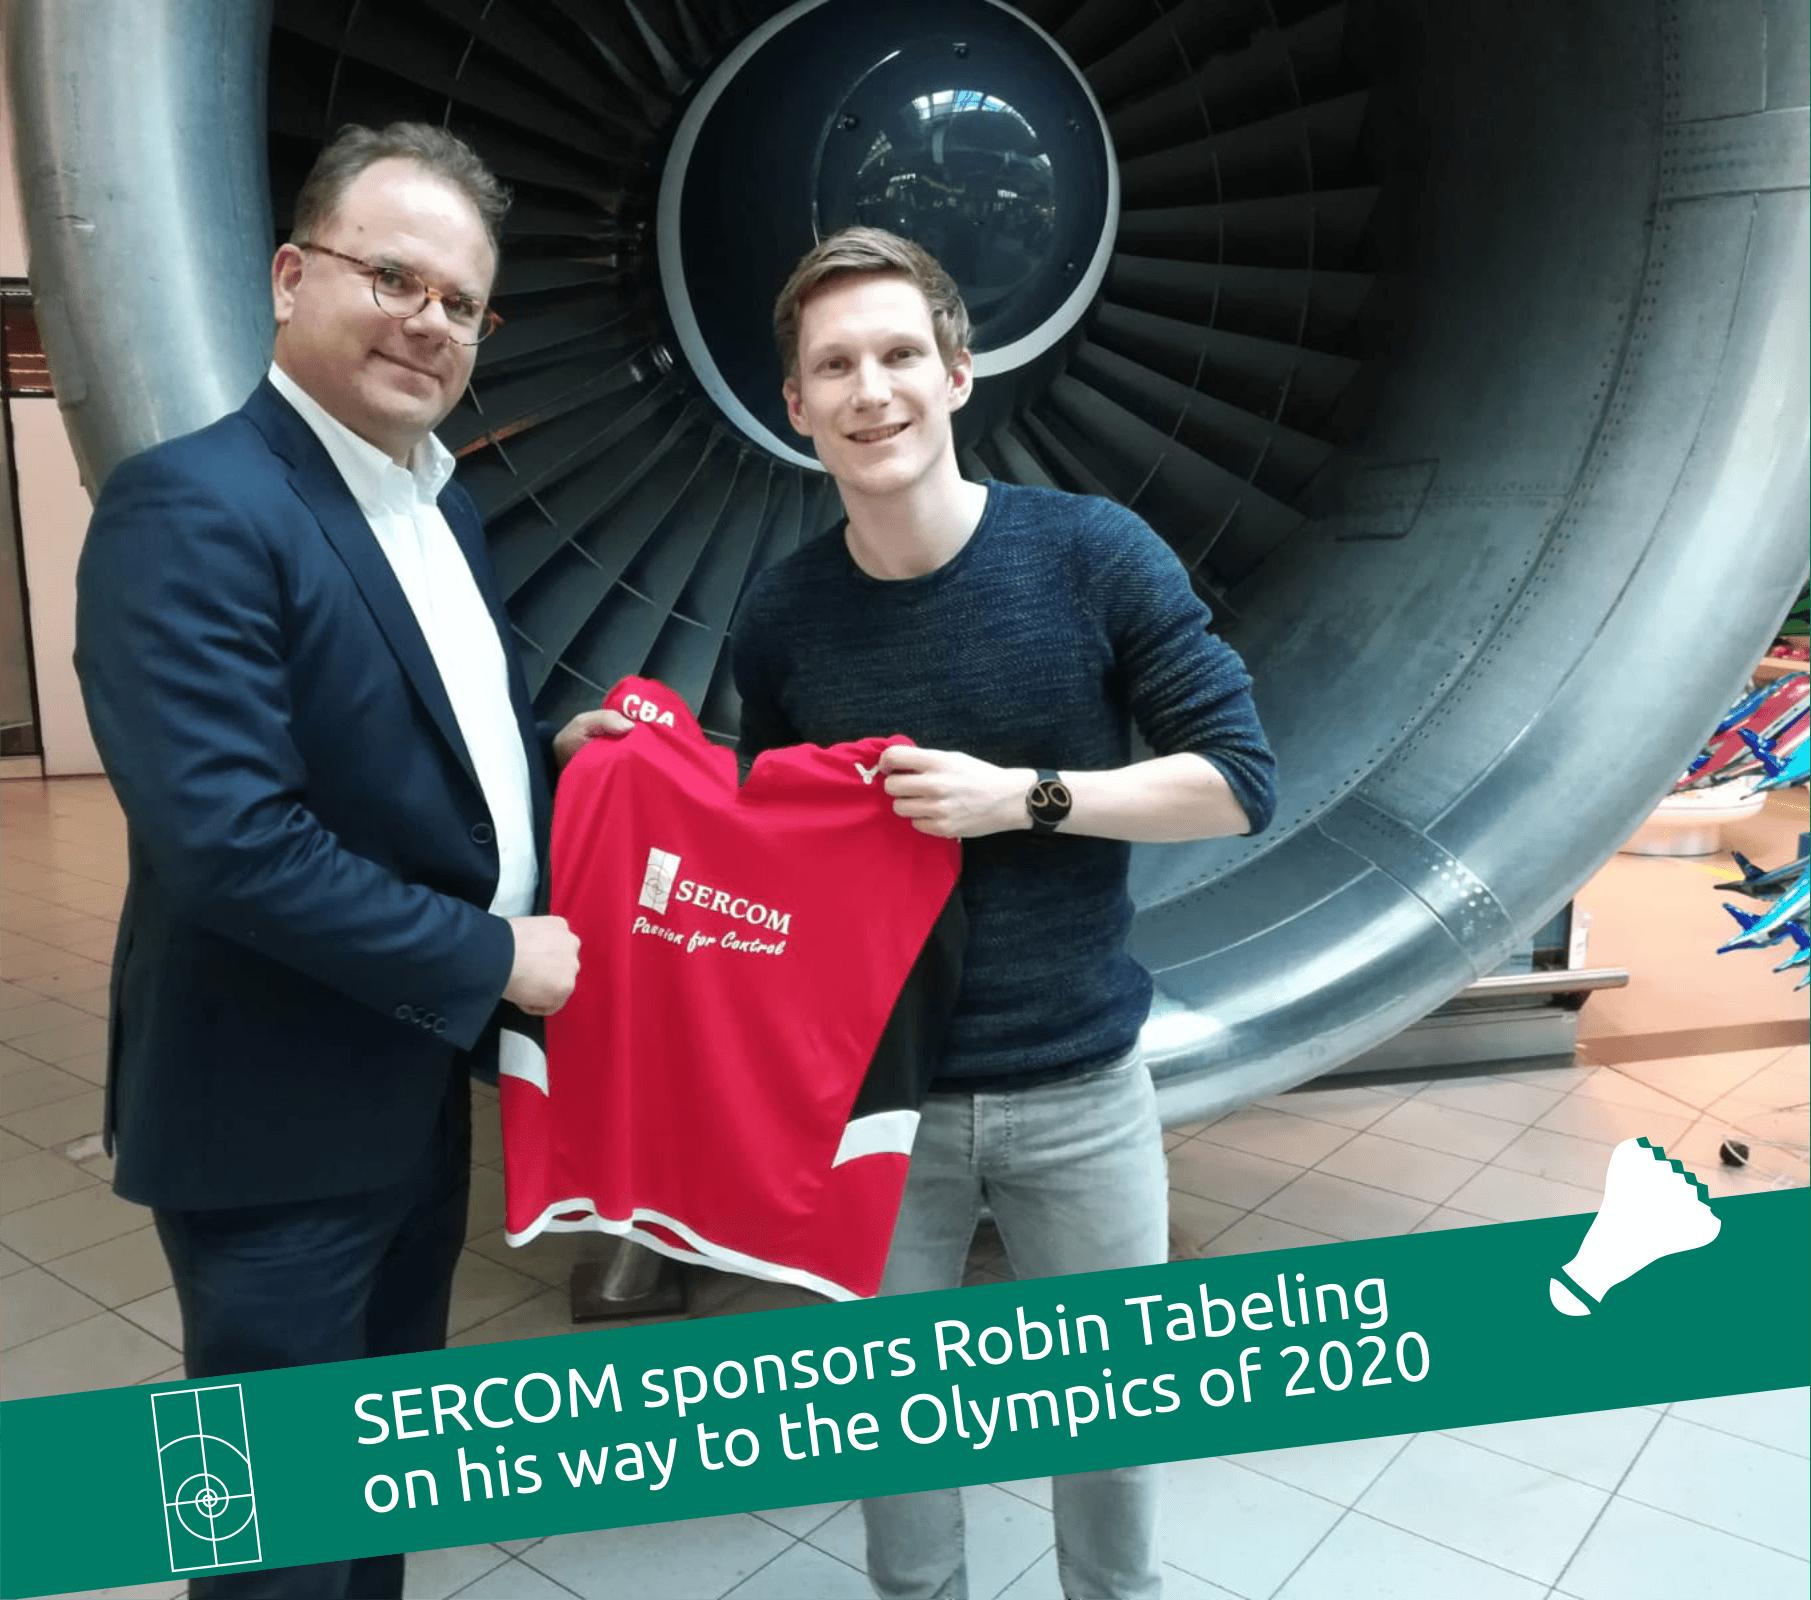 SERCOM sponsors Robin Tabeling